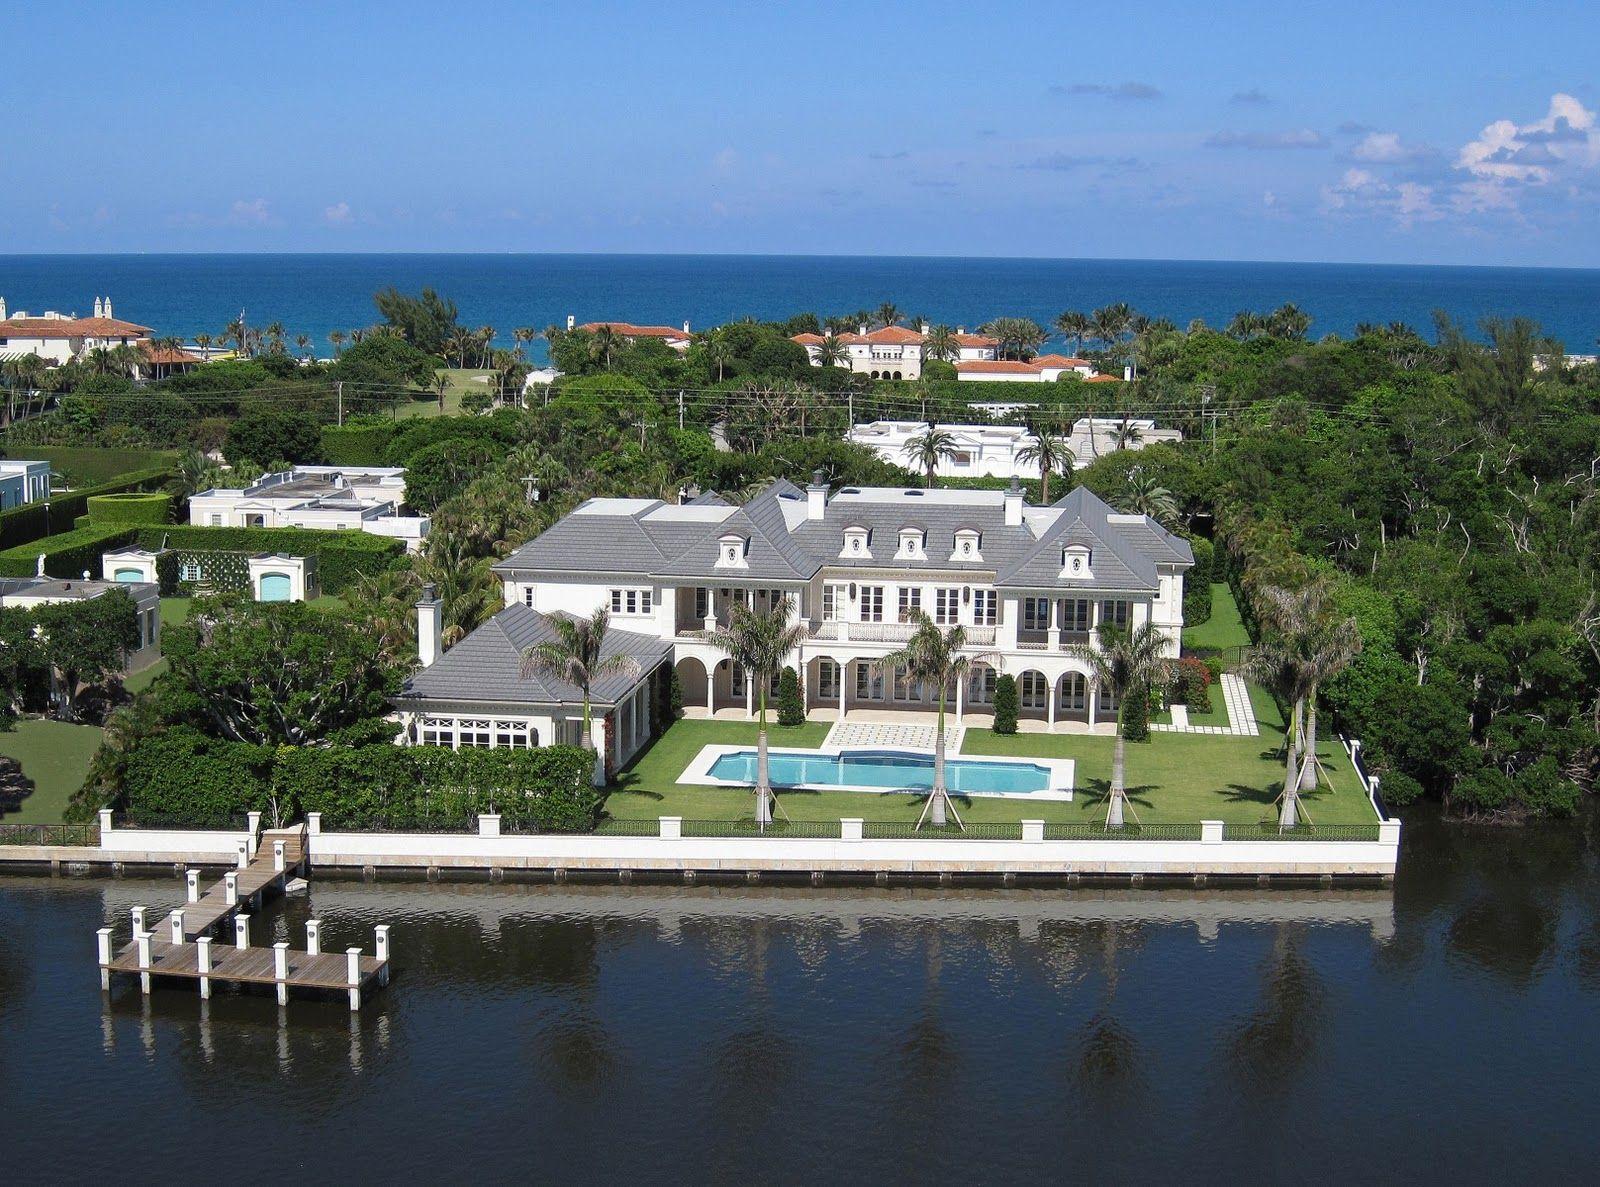 Dan swanson of addison development palm beach florida intracoastal mansion 1220 south ocean boulevard palm beach florida owner dan swanson